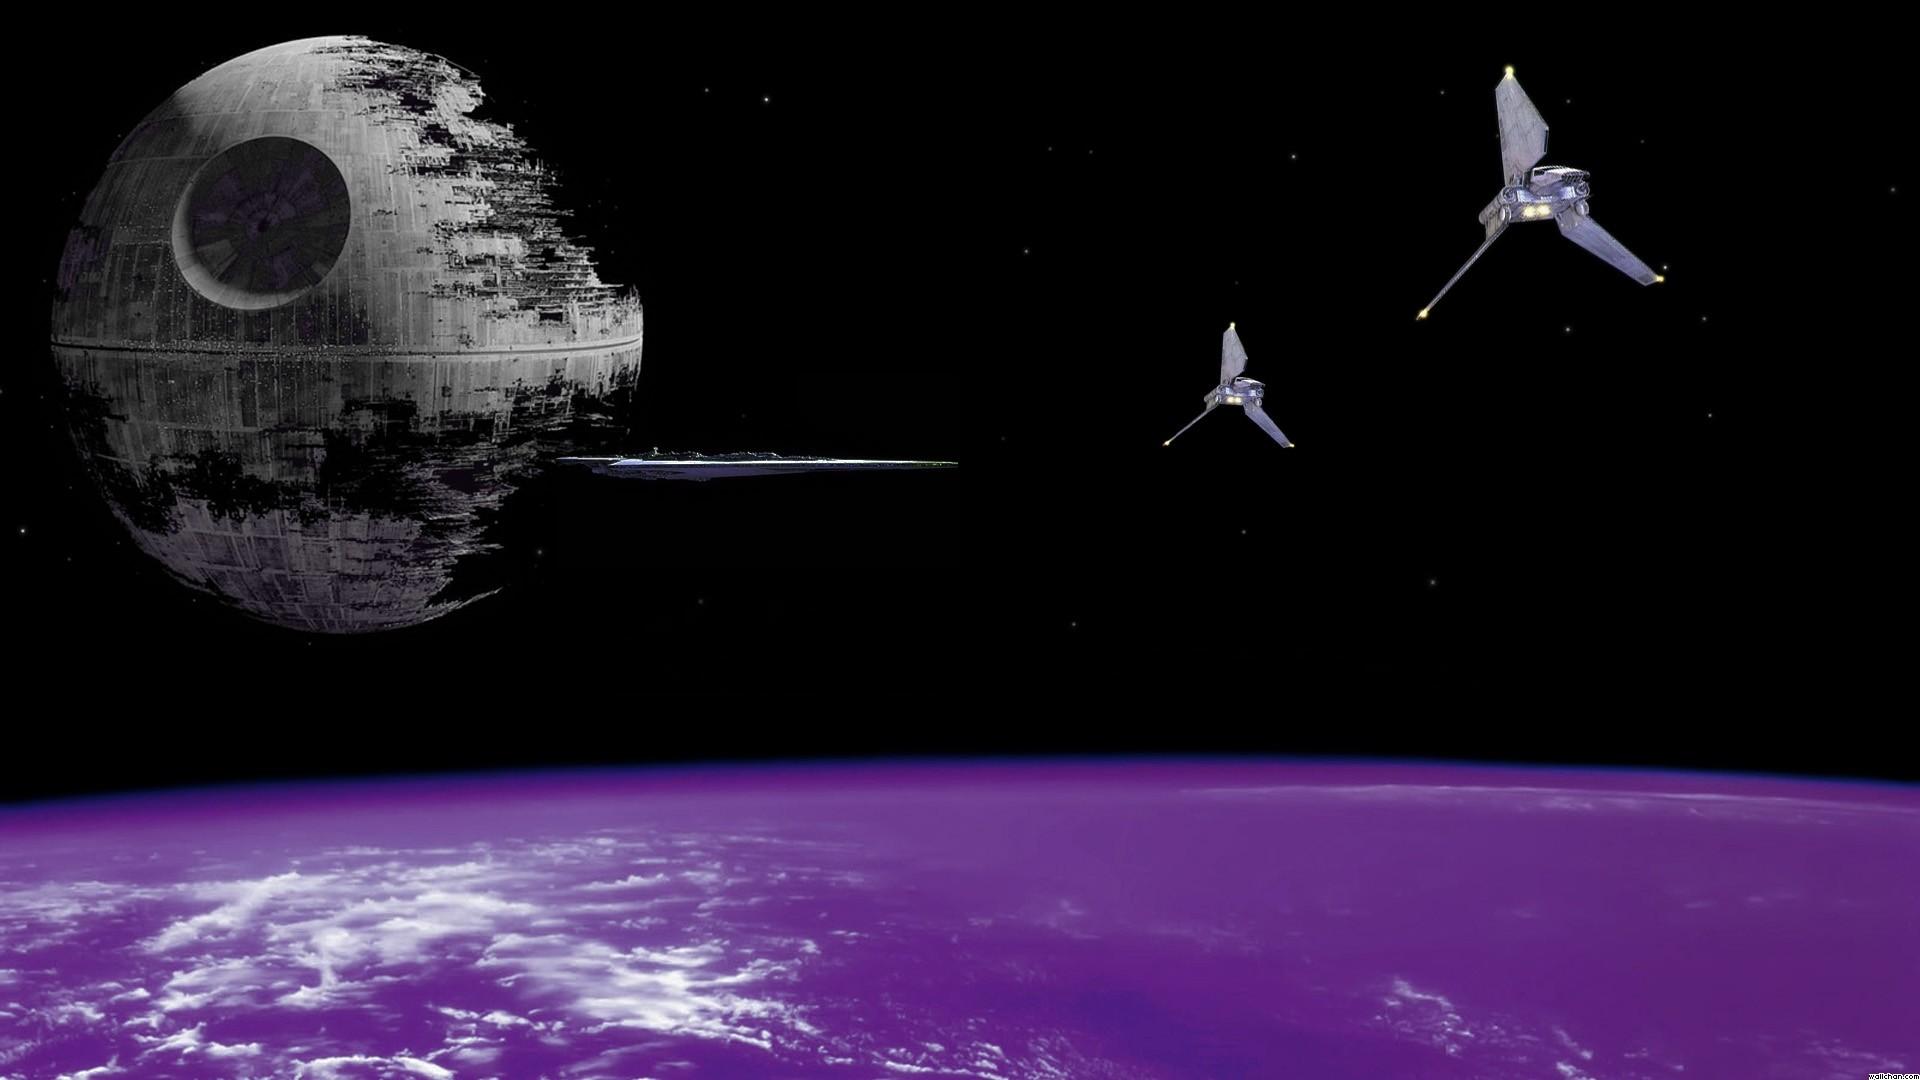 Star Wars Death Star Live 909850 Hd Wallpaper Backgrounds Download